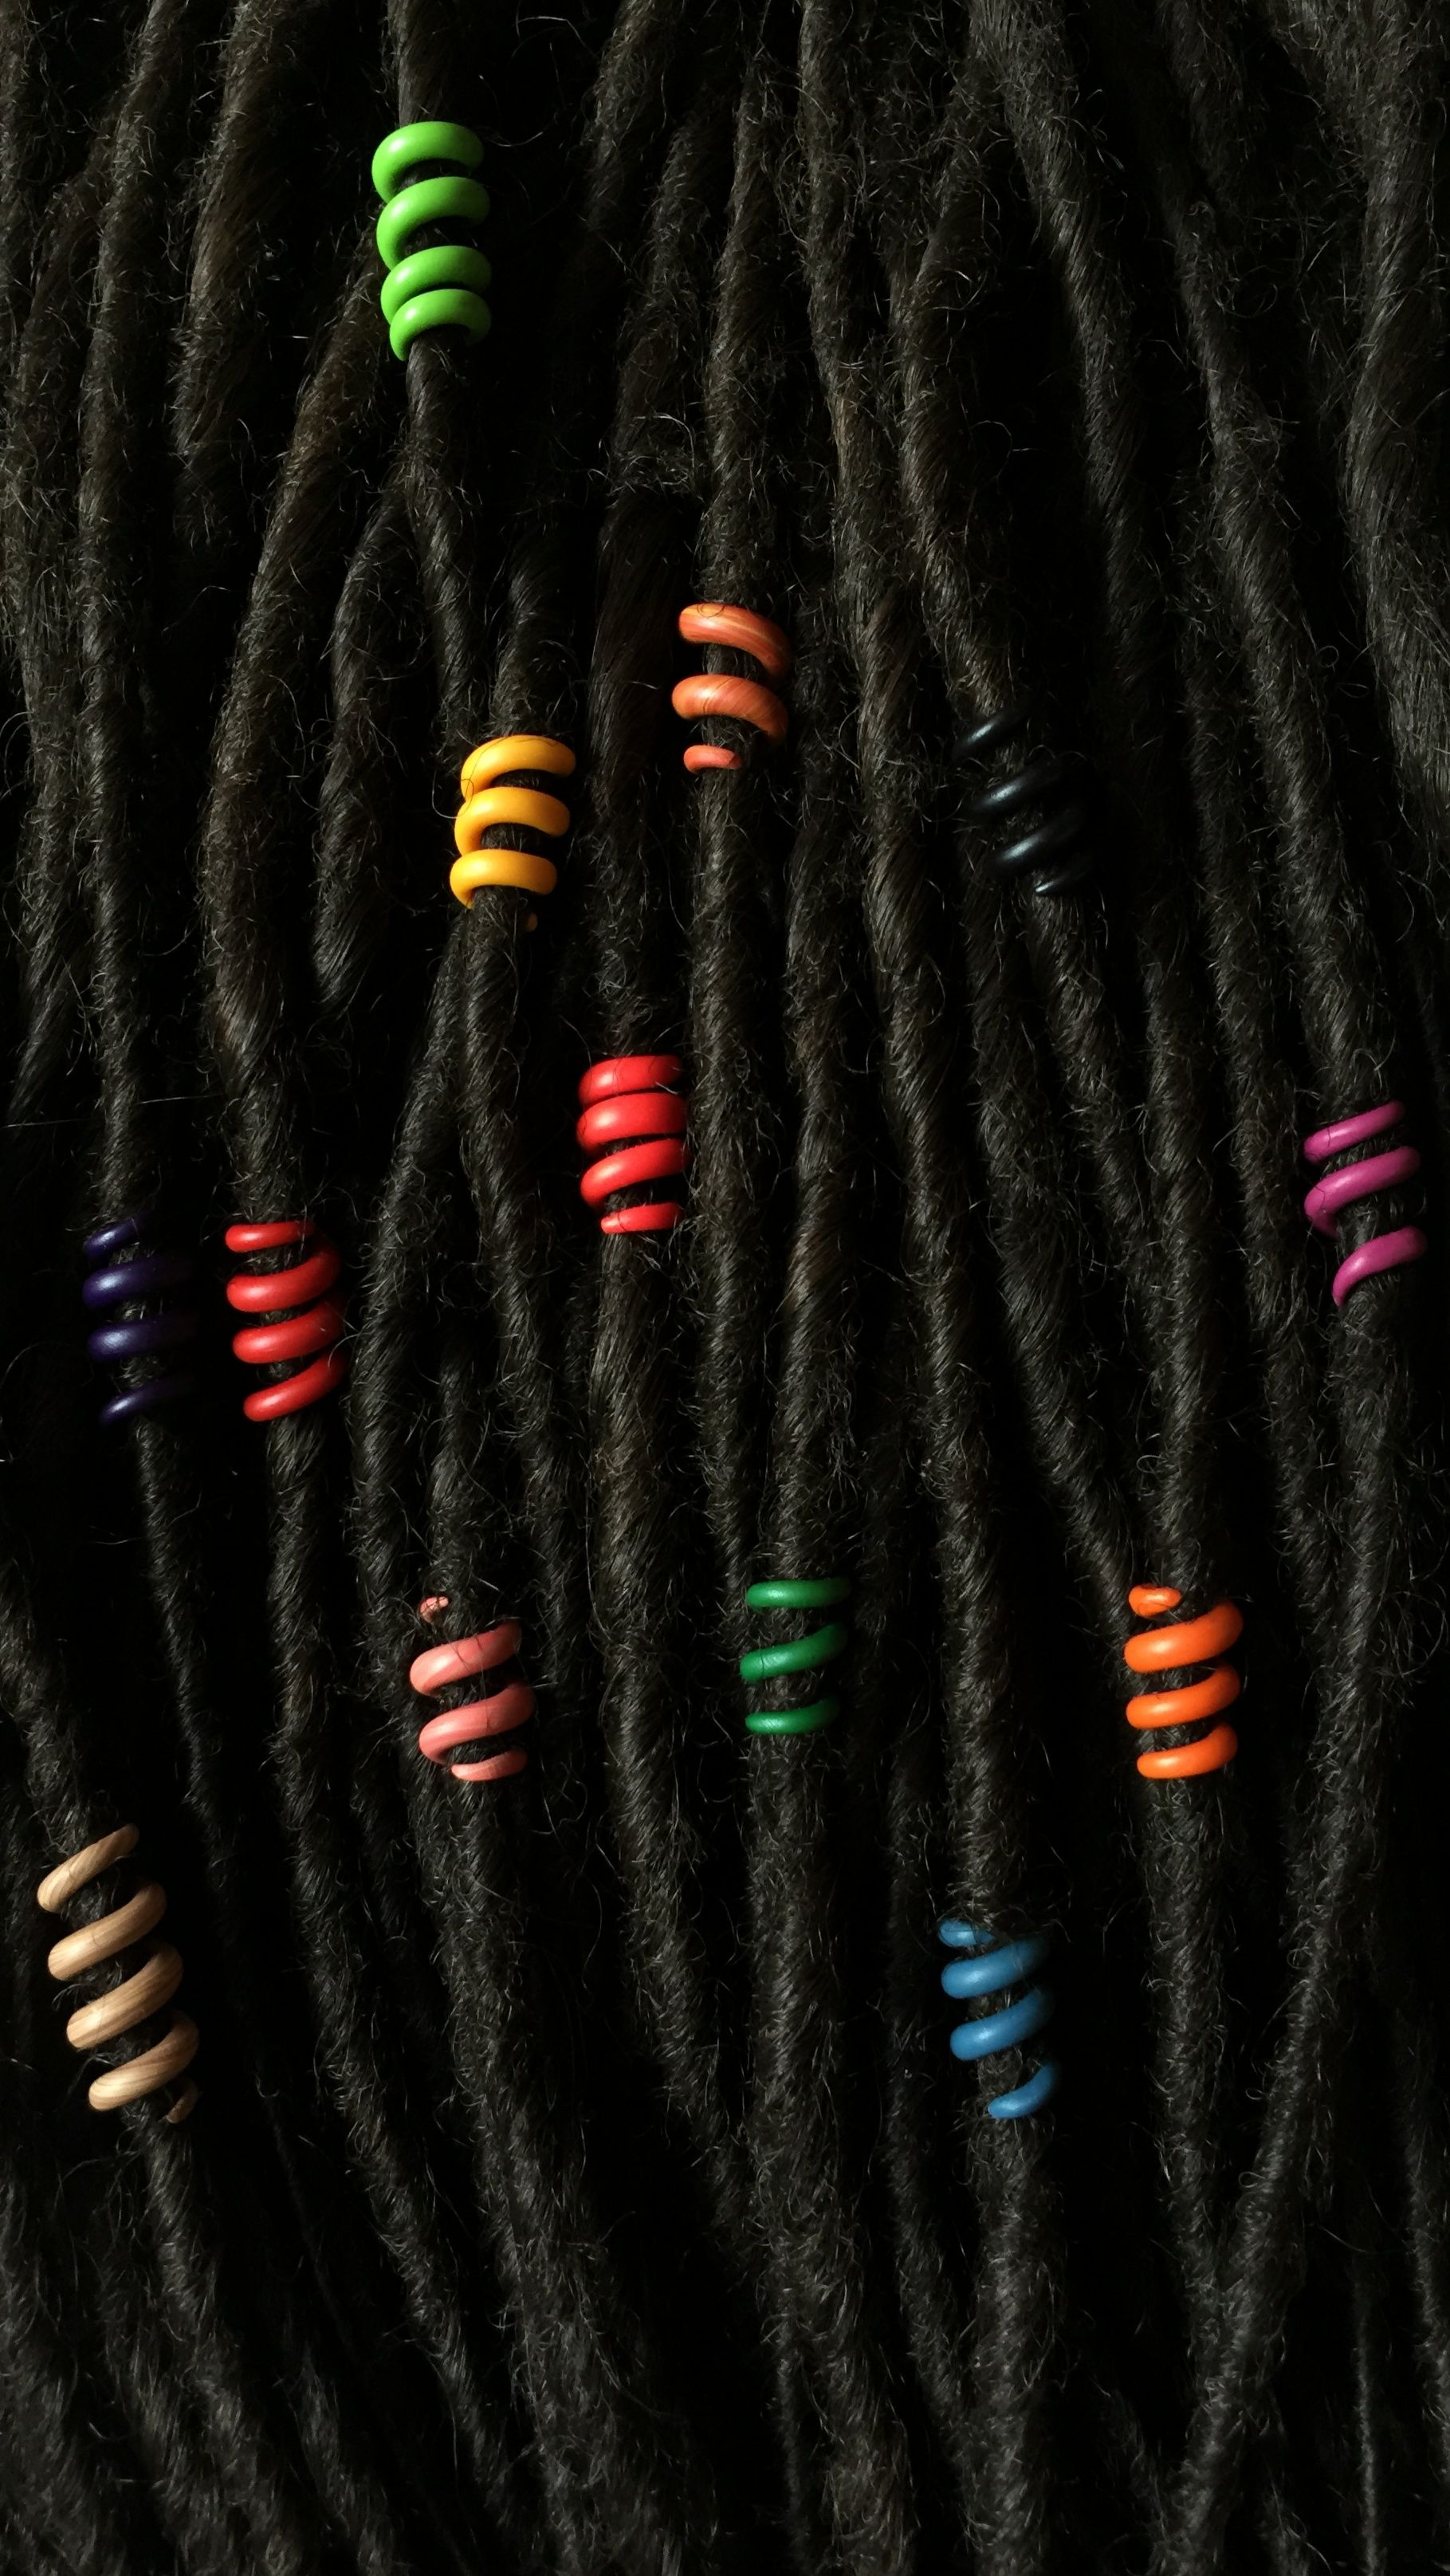 Set Of 13 Dread Beads 6 Mm Dreadlock Beads Hair Bead For Dreads Bead